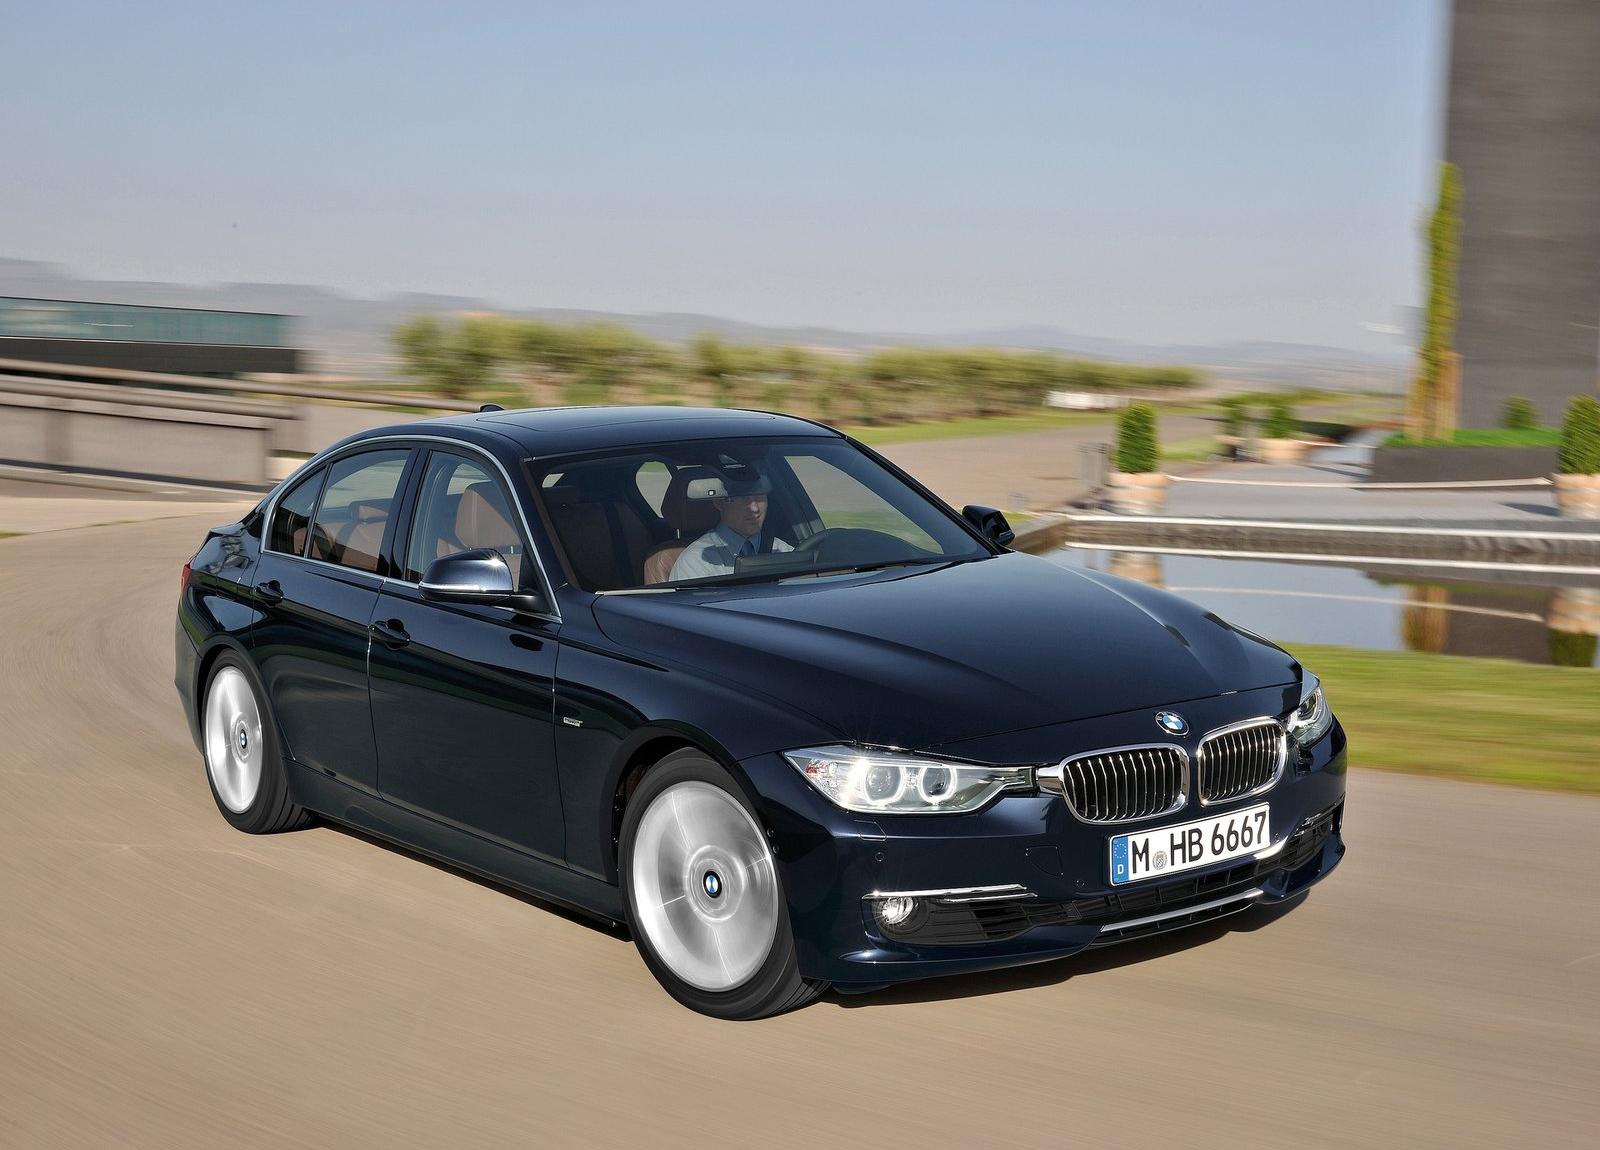 http://4.bp.blogspot.com/-z5TfB97jO3E/UCp0rg7GV9I/AAAAAAAAHF4/kTGrb7FUzVc/s1600/BMW-3-Series_2012_1600x1200_wallpaper_15.jpg